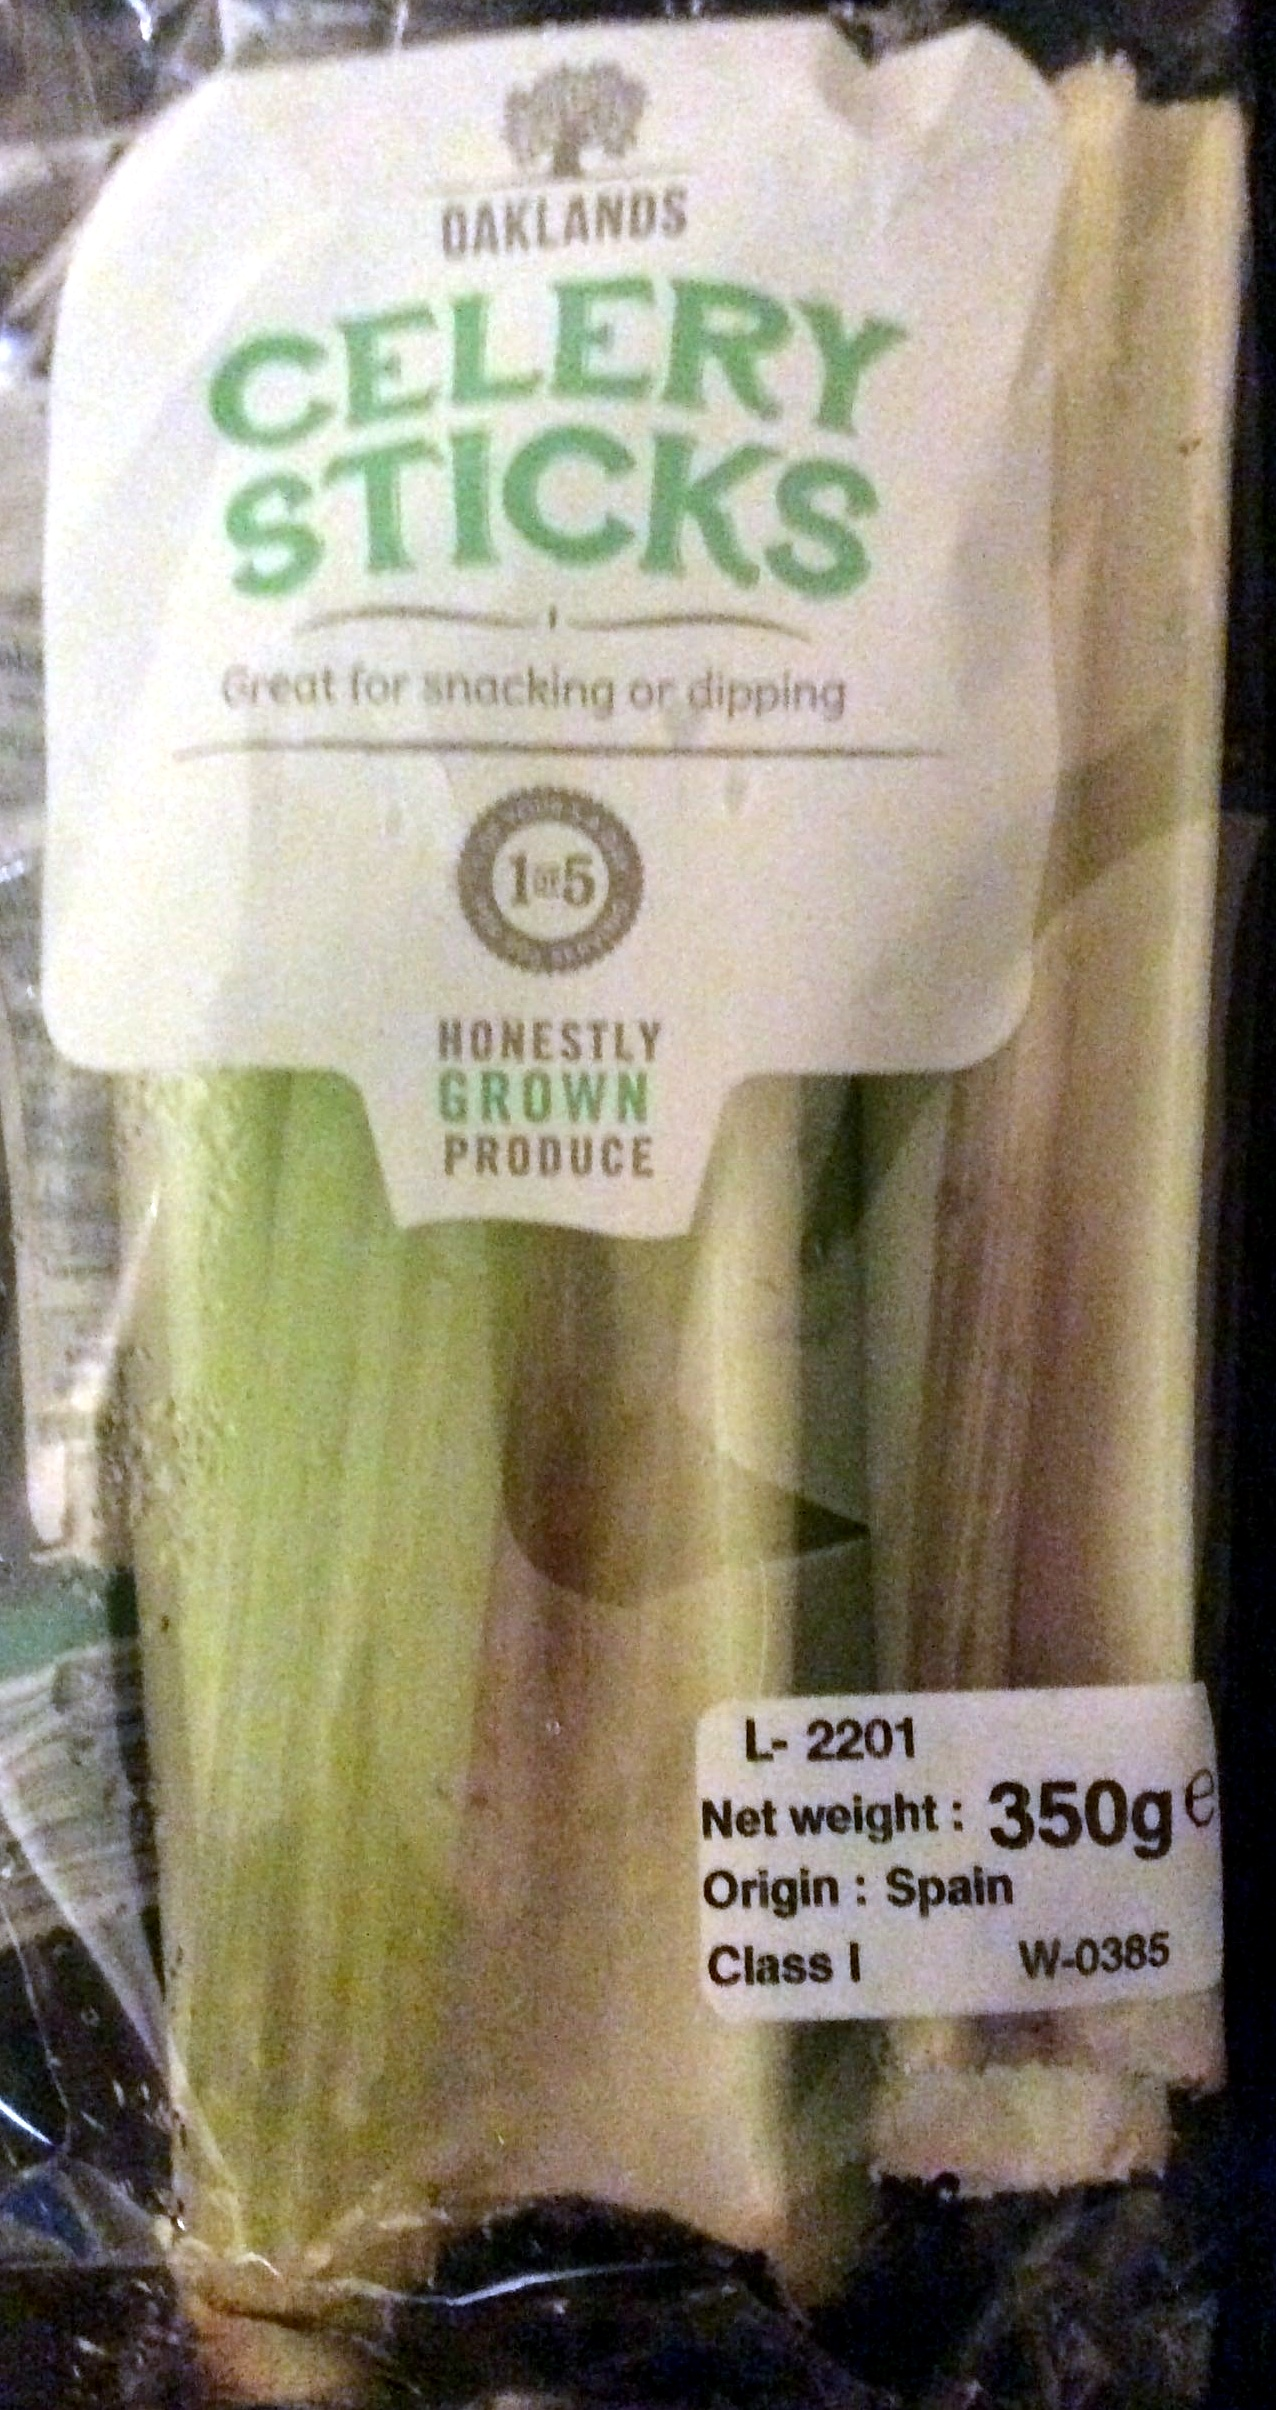 fresh celery sticks - Product